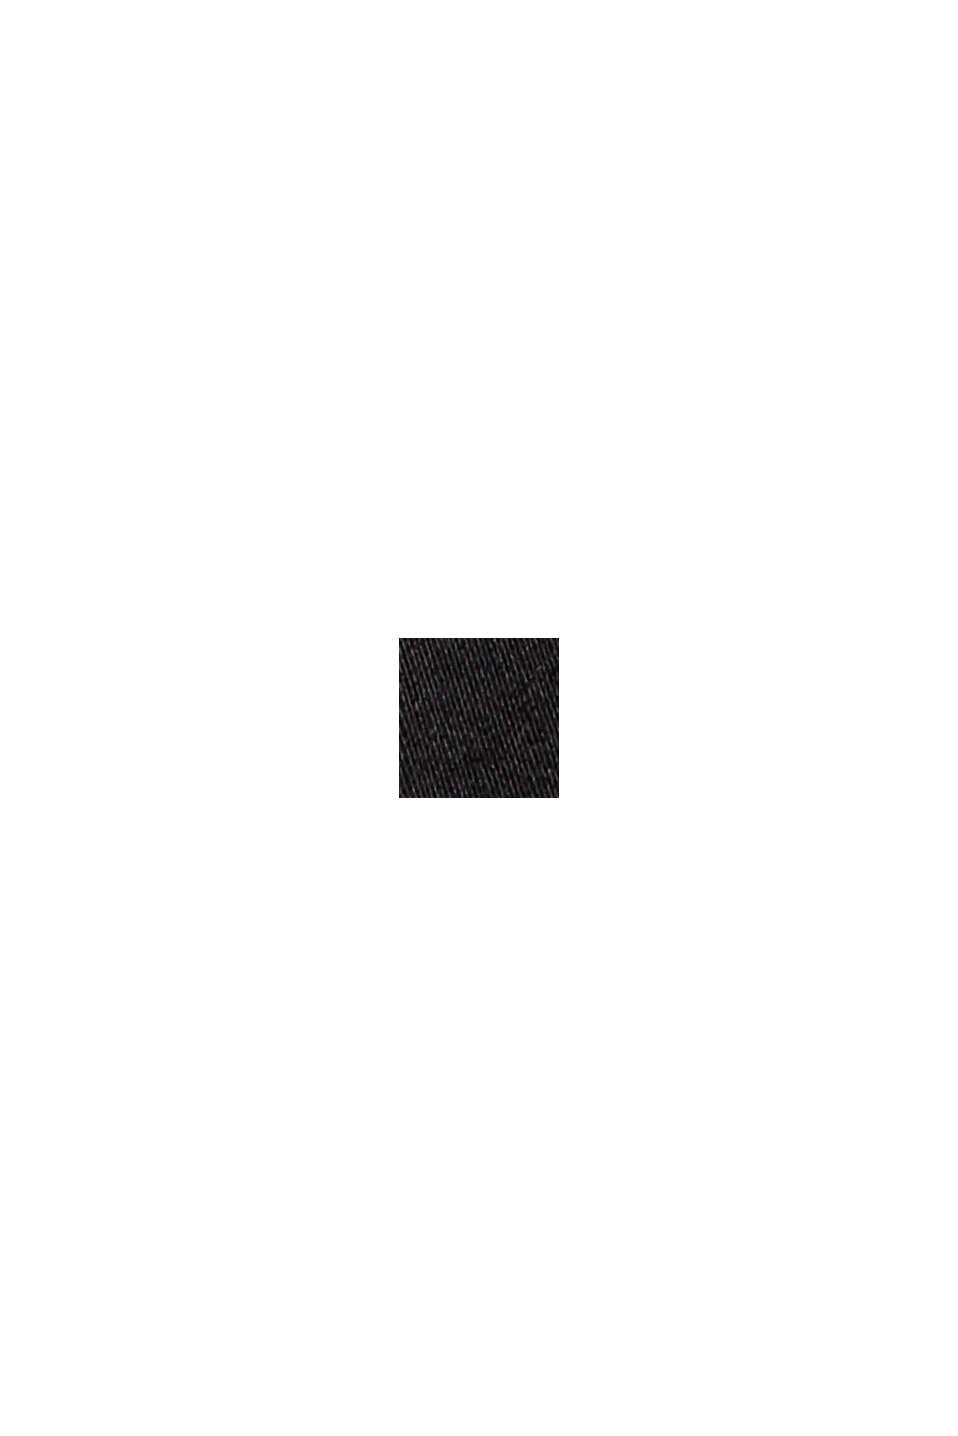 Stretchhousut puuvillasekoitetta, BLACK, swatch